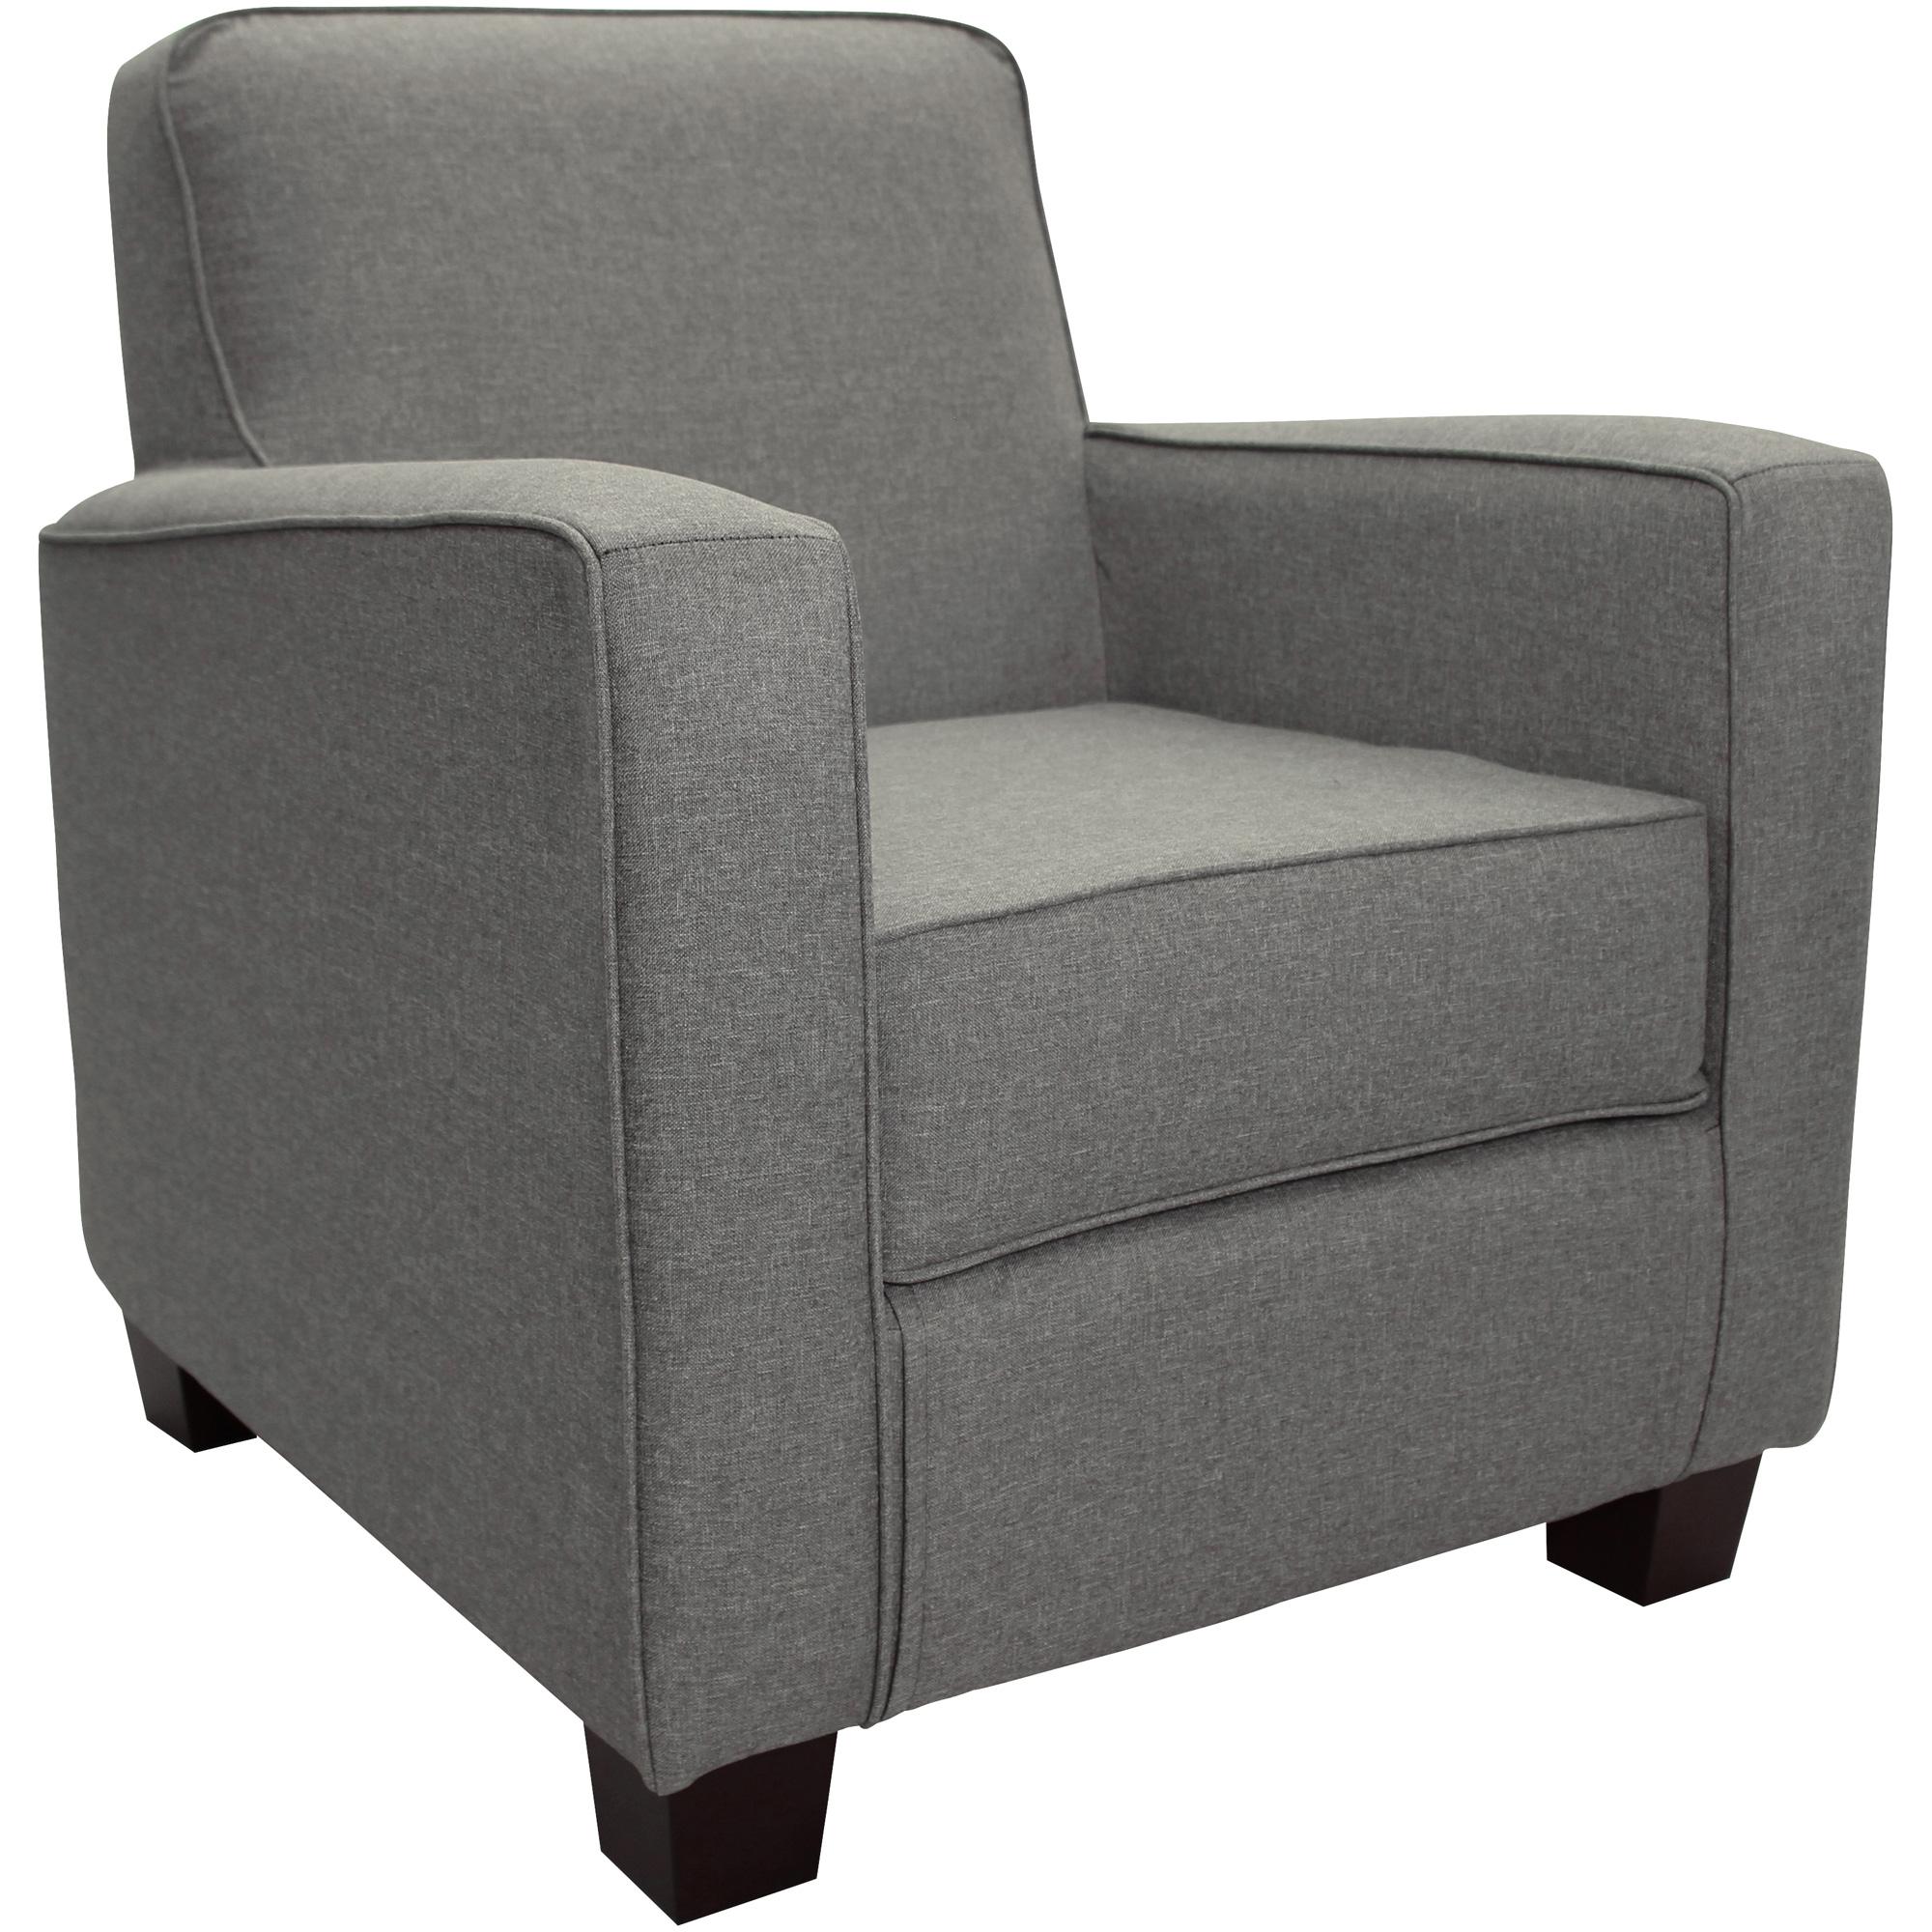 Overman | Johnston Quartz Accent Chair